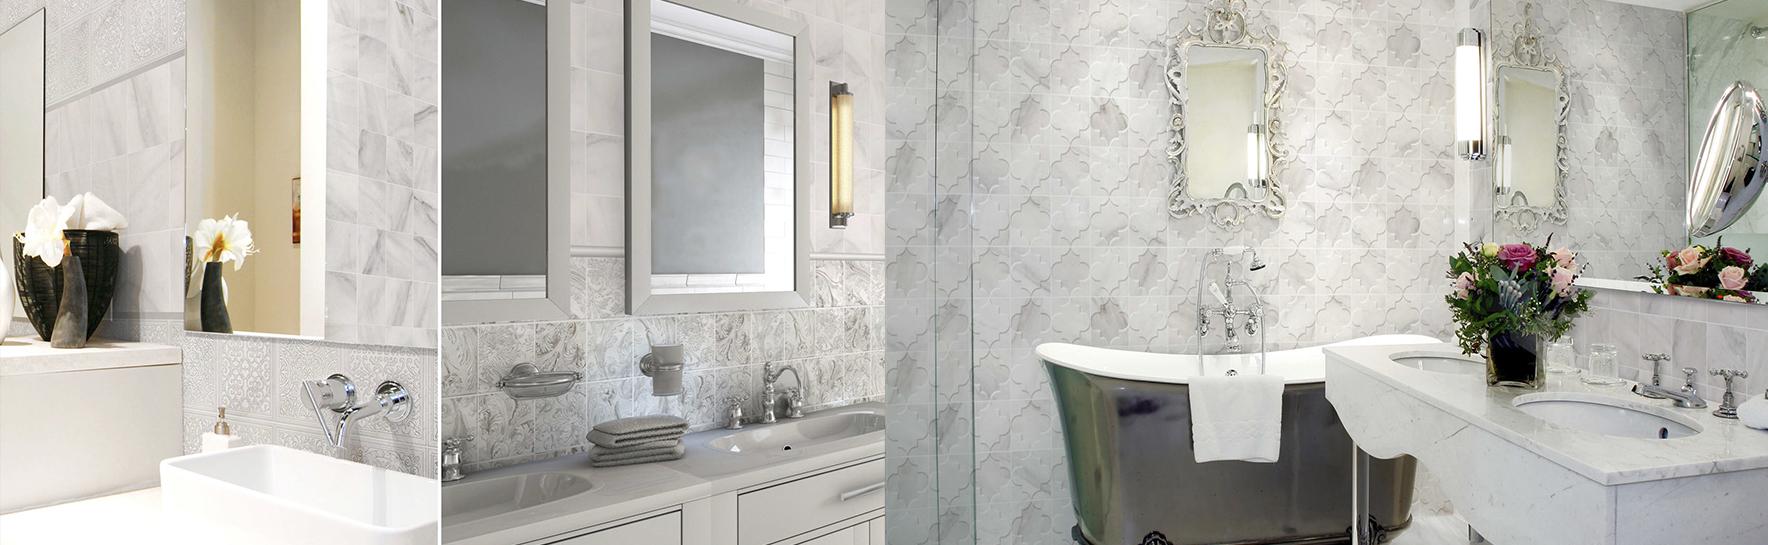 Savoy Bathroom Wall Tiles 30x60 Cm